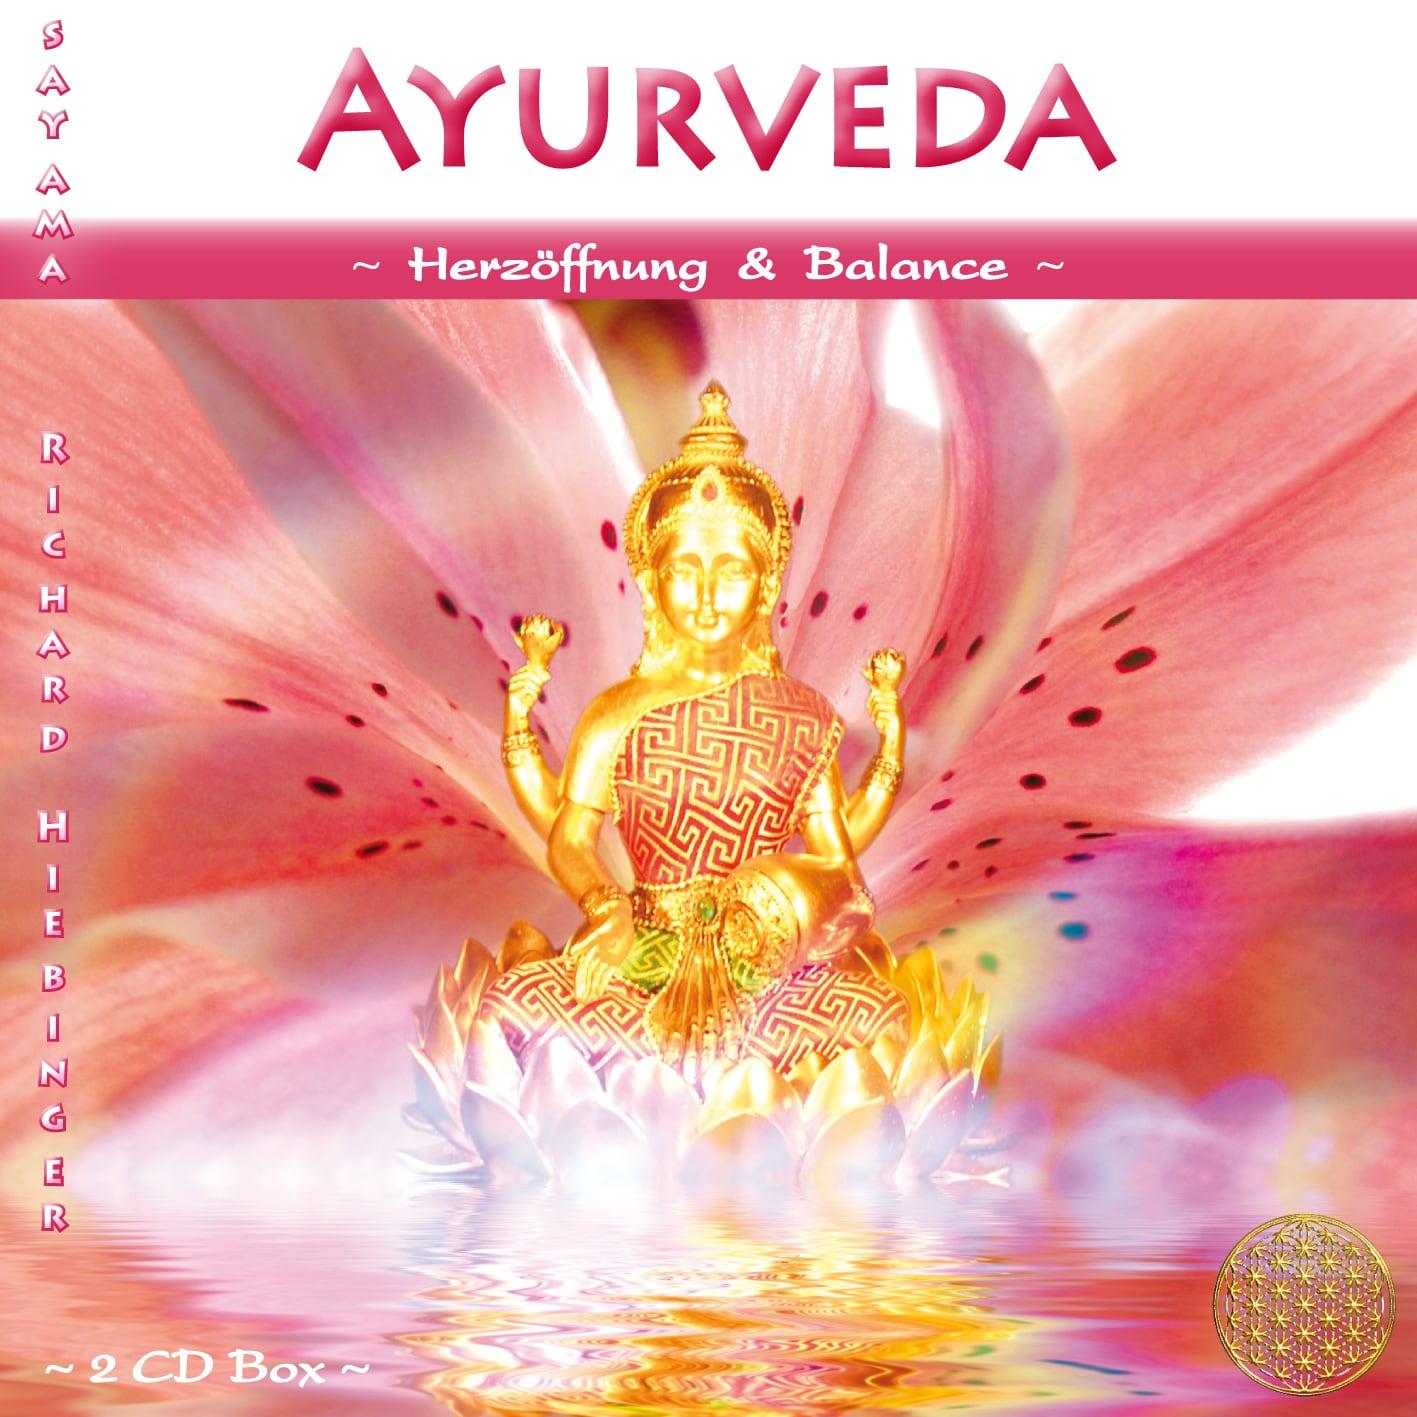 CD Titelbild Ayurveda ~ Herzöffnung & Balance von Sayama Music Richard Hiebinger. https://www.sayama-music.de/cds/ayurveda/